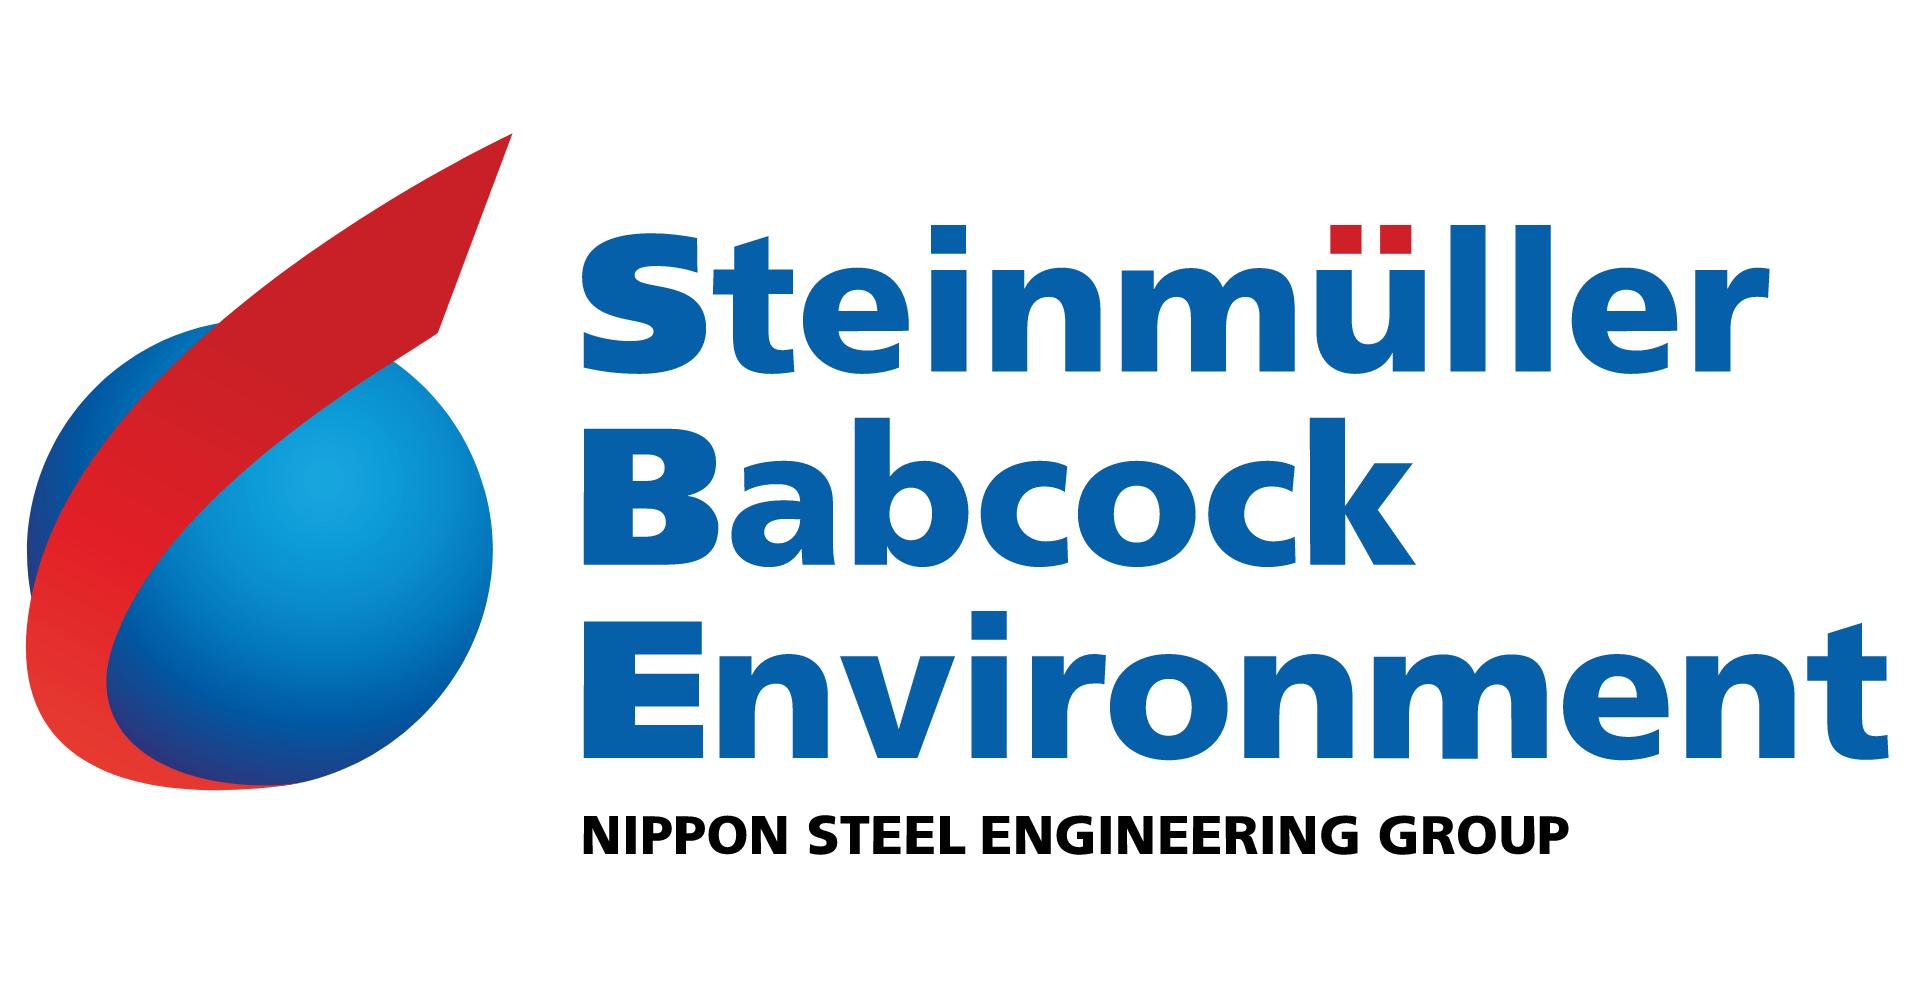 Steinmüller Babcock Environment